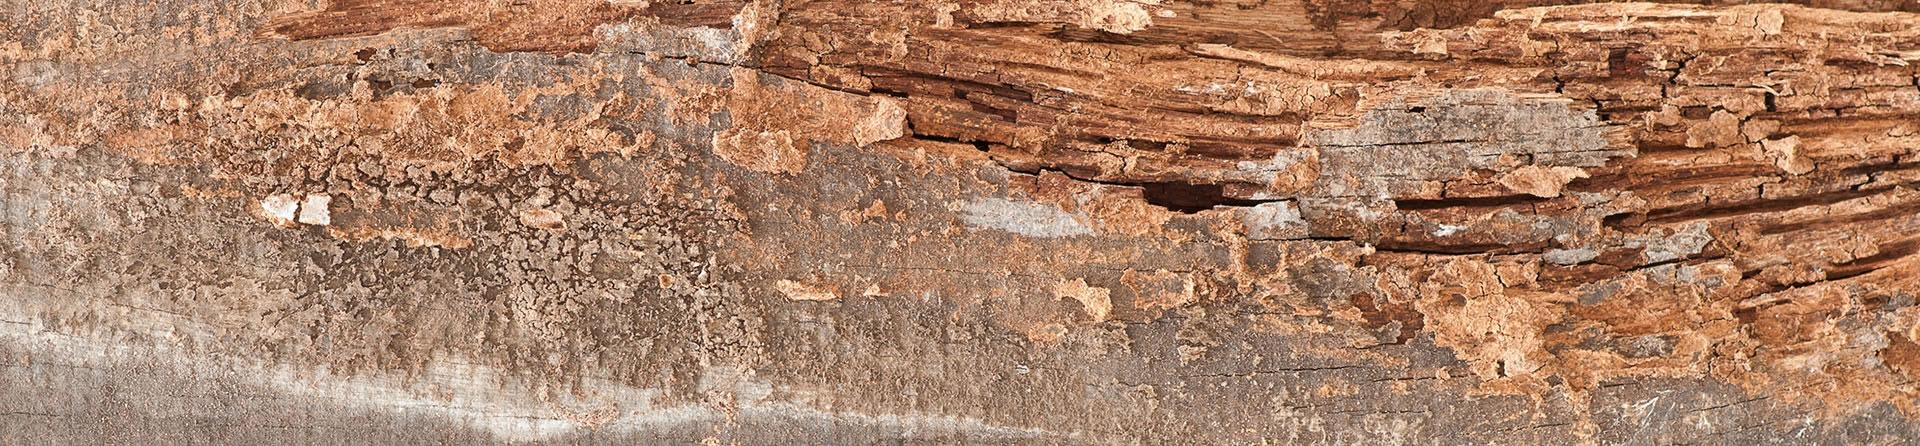 Termite Damage Repair in Sacramento